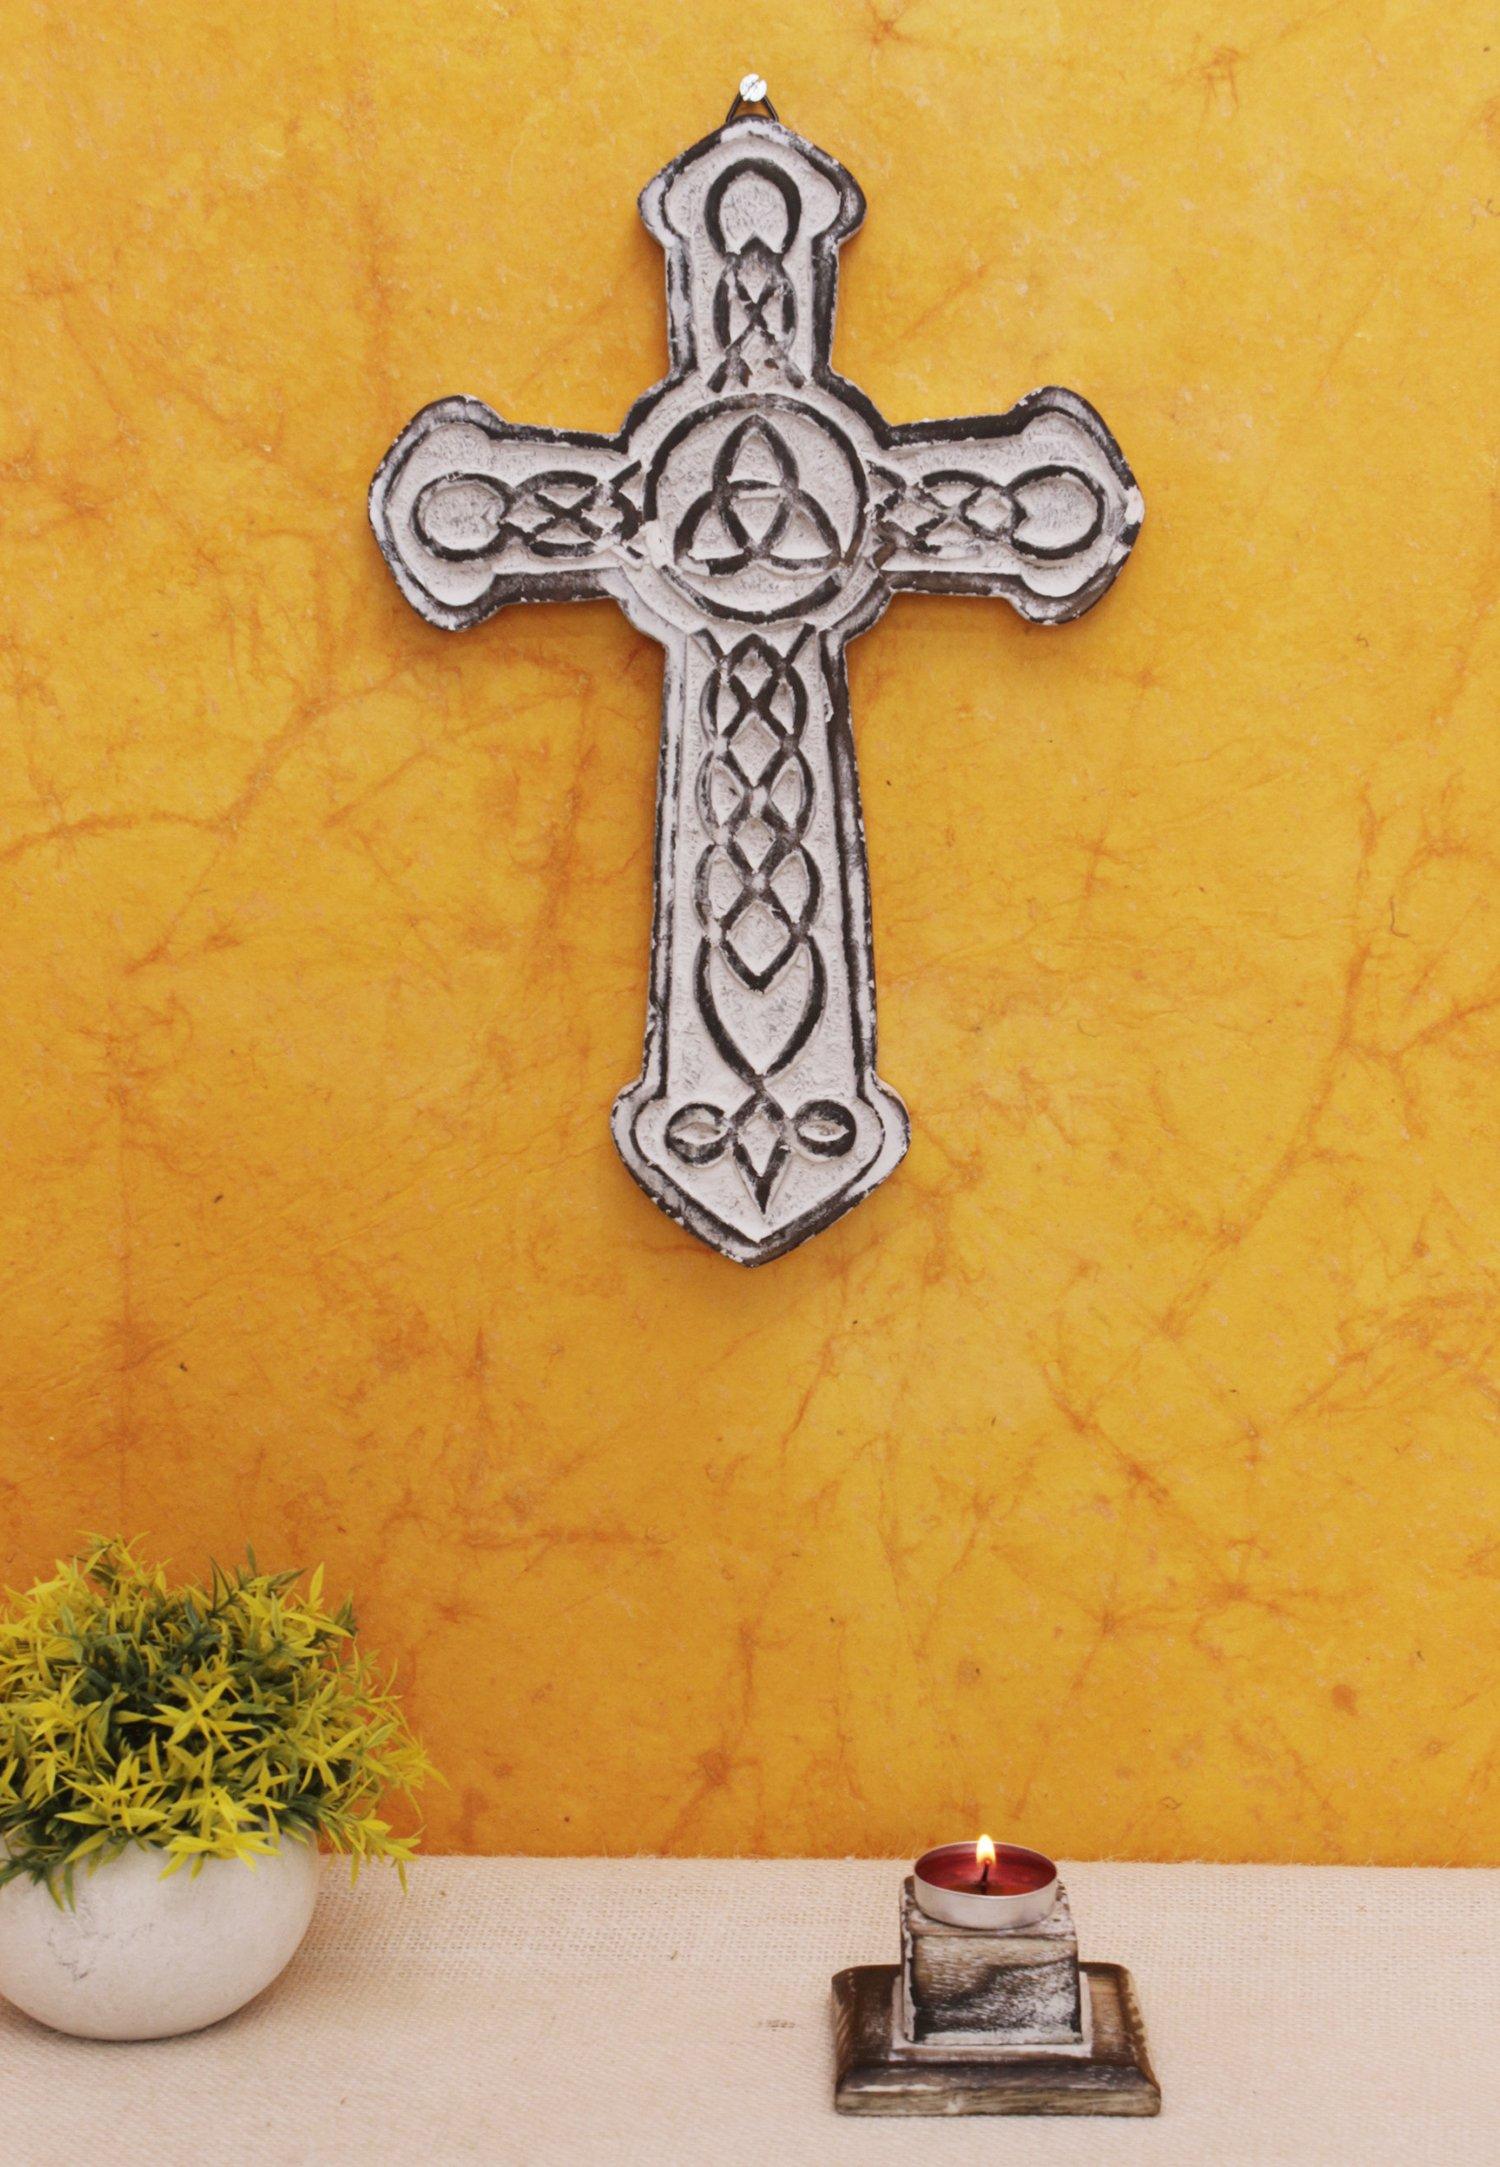 The StoreKing Wooden Decorative Wall Cross French Handmade Plaque Religious Altar Cross Home Living Room Home Decor (Design6)